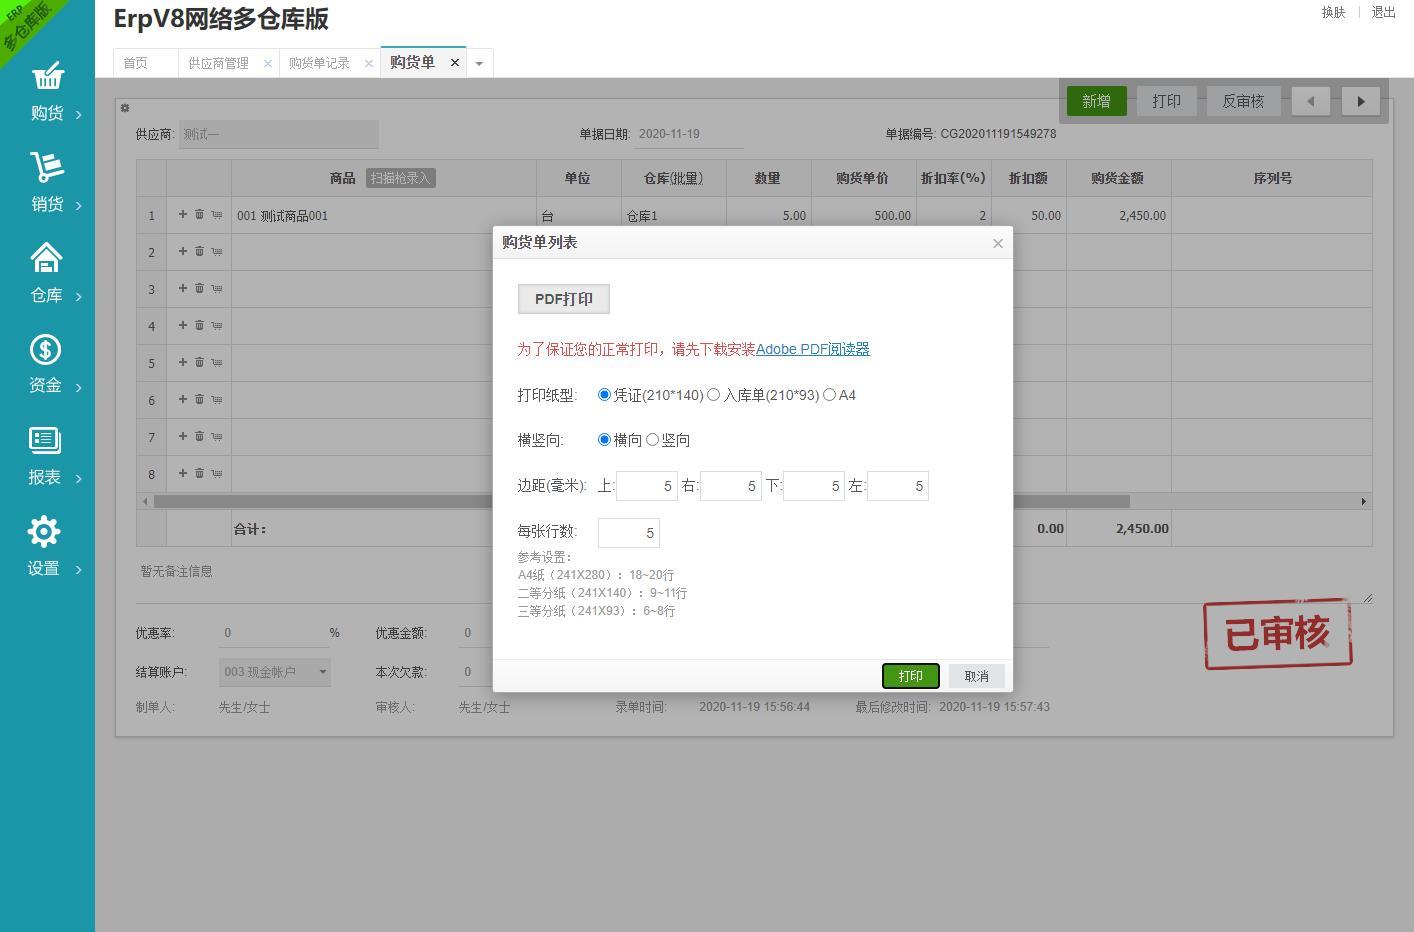 php开发的仿金蝶ERP云进销存系统多仓库版源码